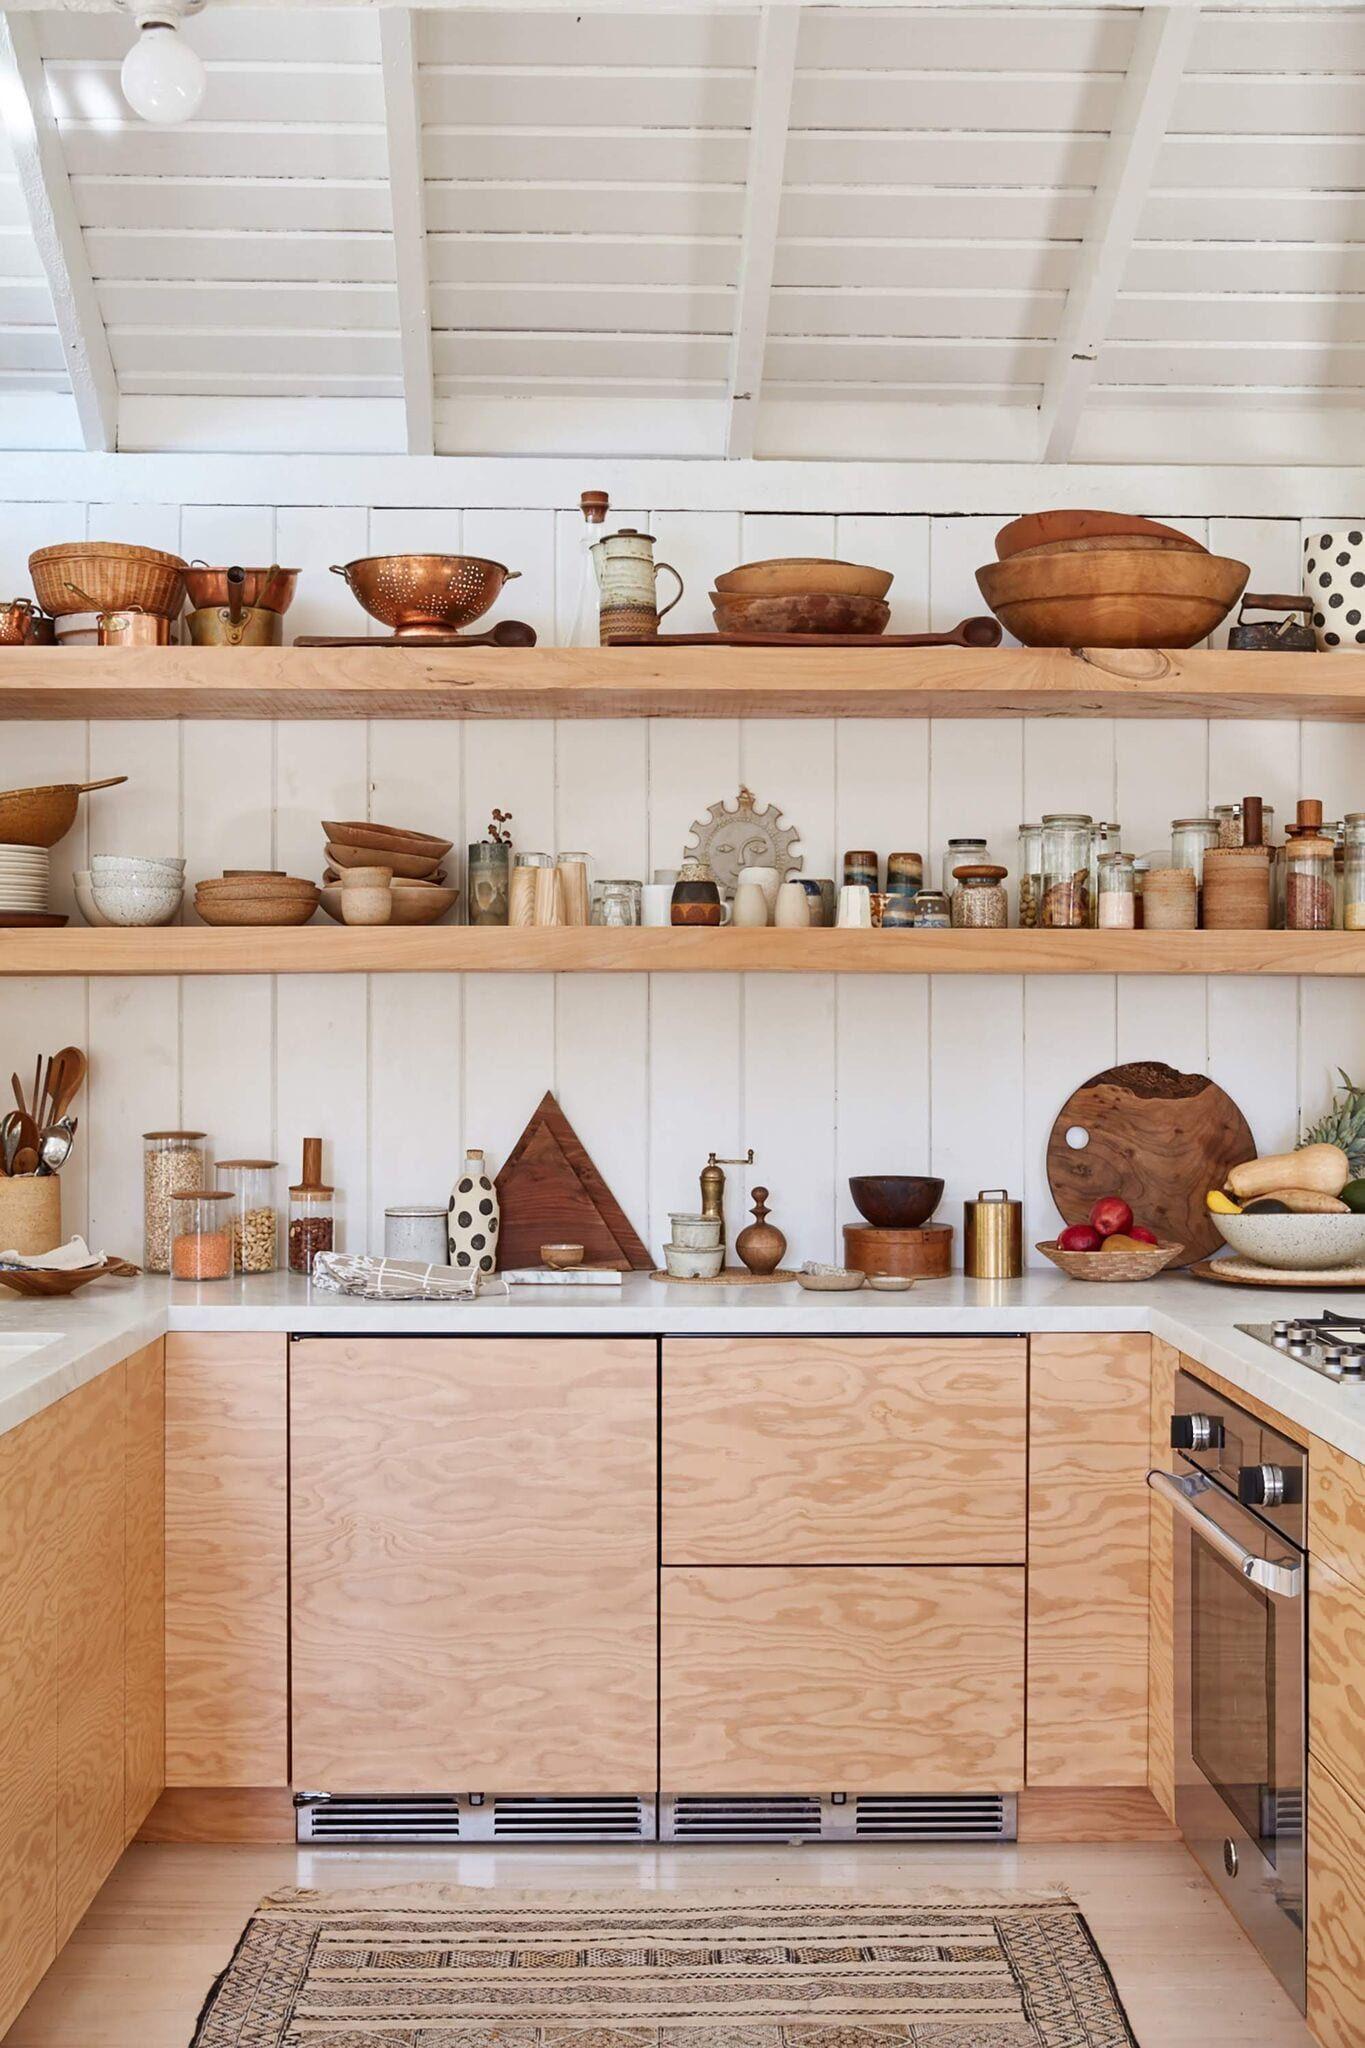 18 Kitchen Ideas To Redesign And Redecorate Your Home Plywood Kitchen Kitchen Design Contemporary Kitchen Design